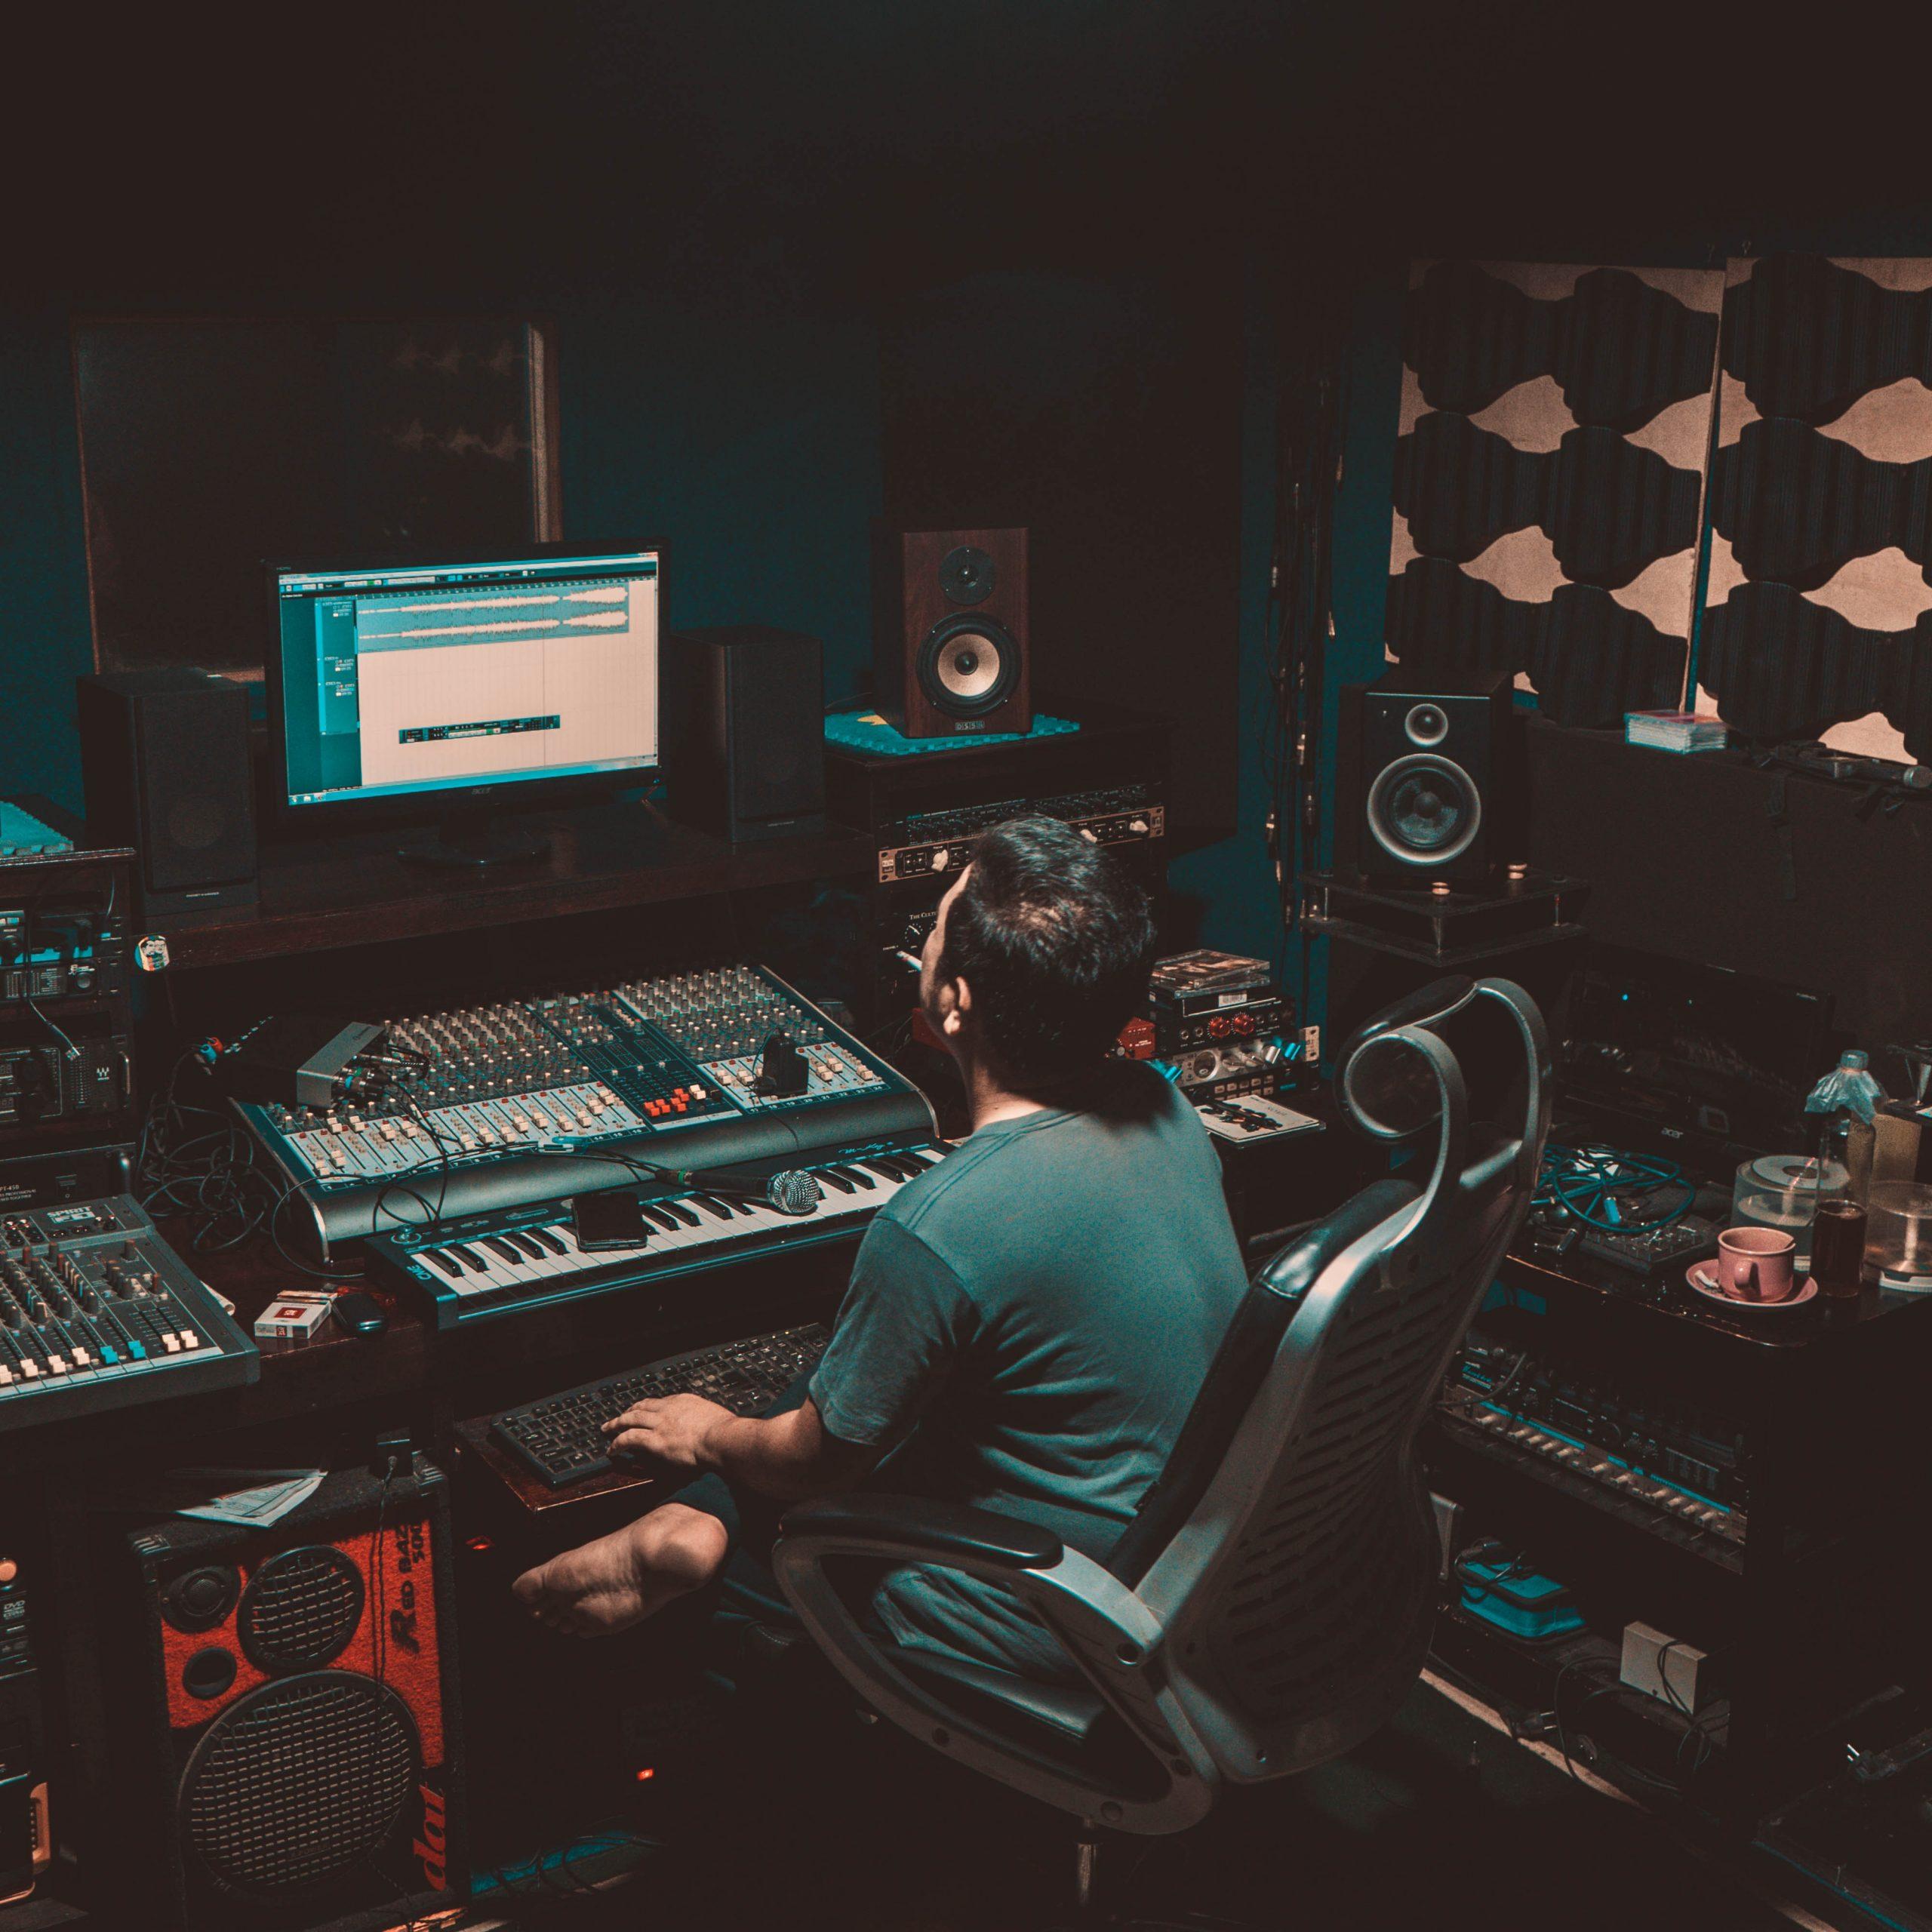 Studio - Fot. Jesman Fabio